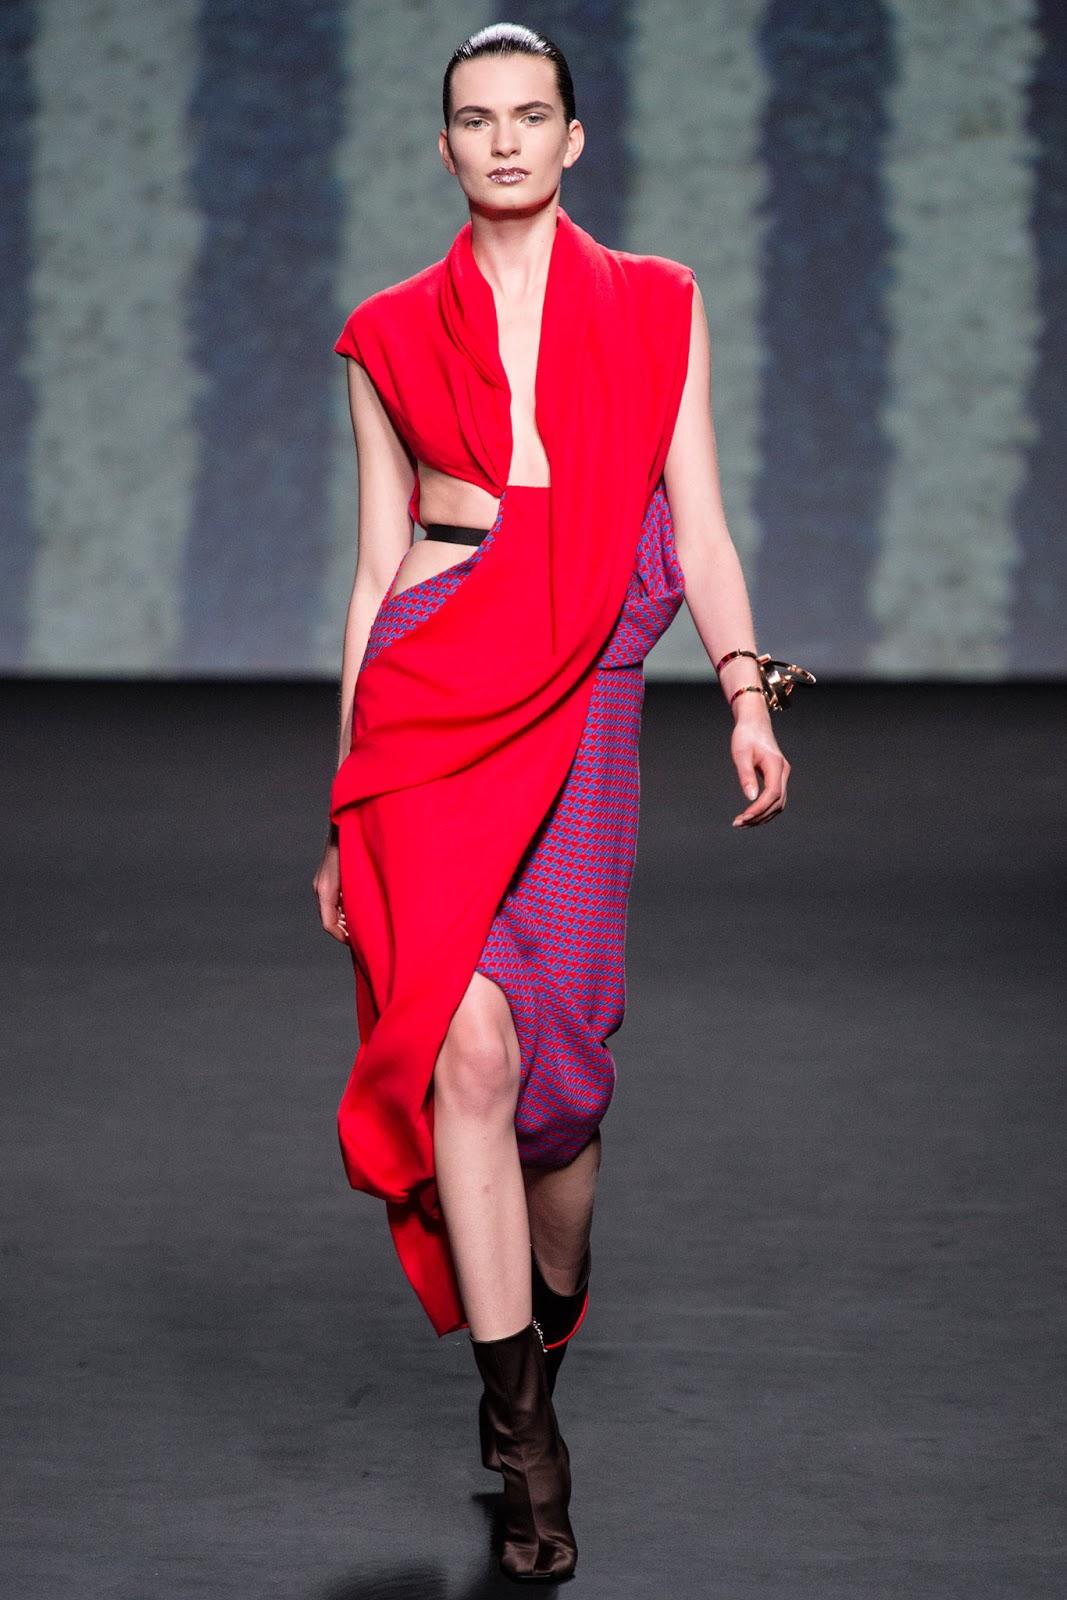 CHRISTIAN DIOR HAUTE COUTURE FALL WINTER 2014  Christian Dior Haute Couture 2014